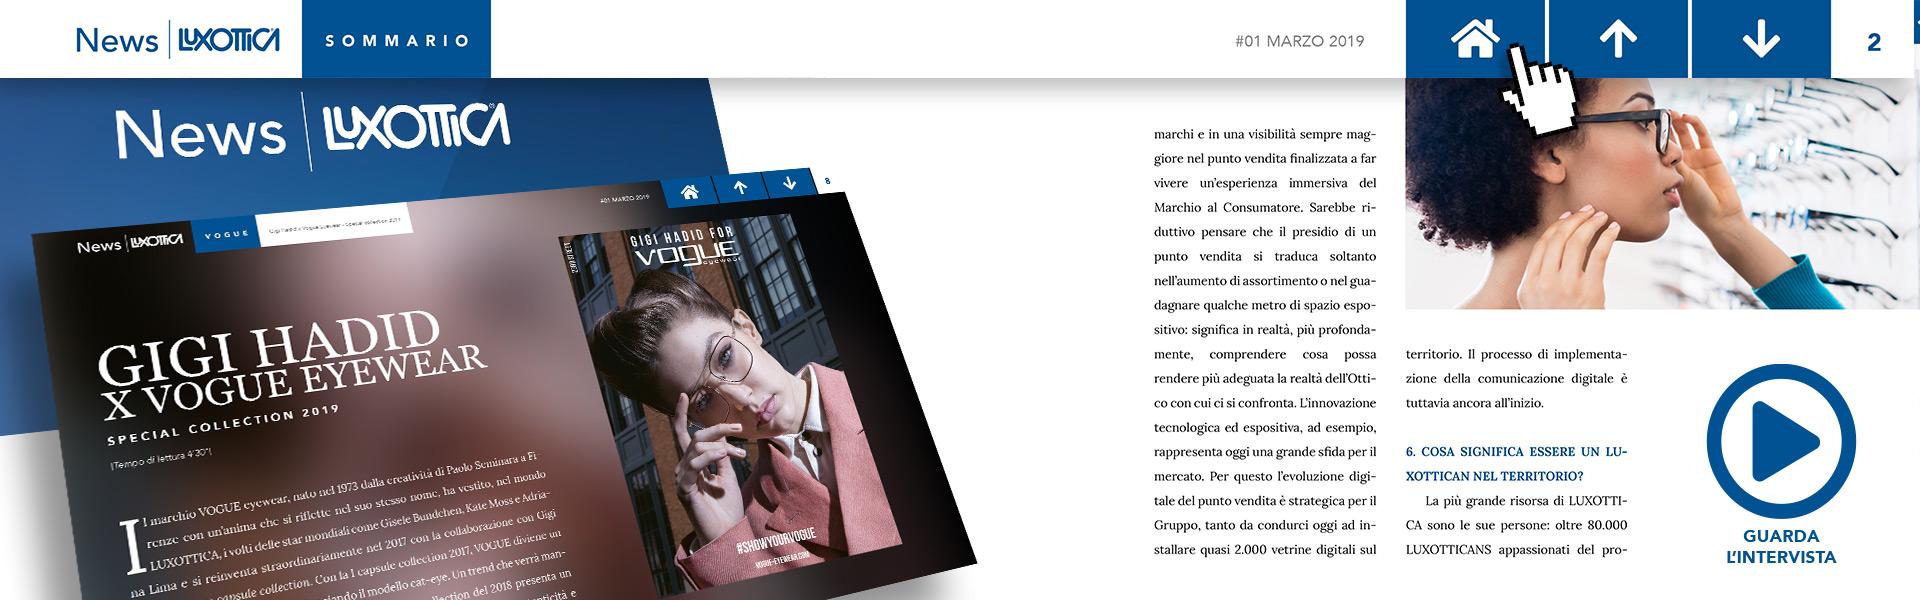 Luxottica news digital-header-1